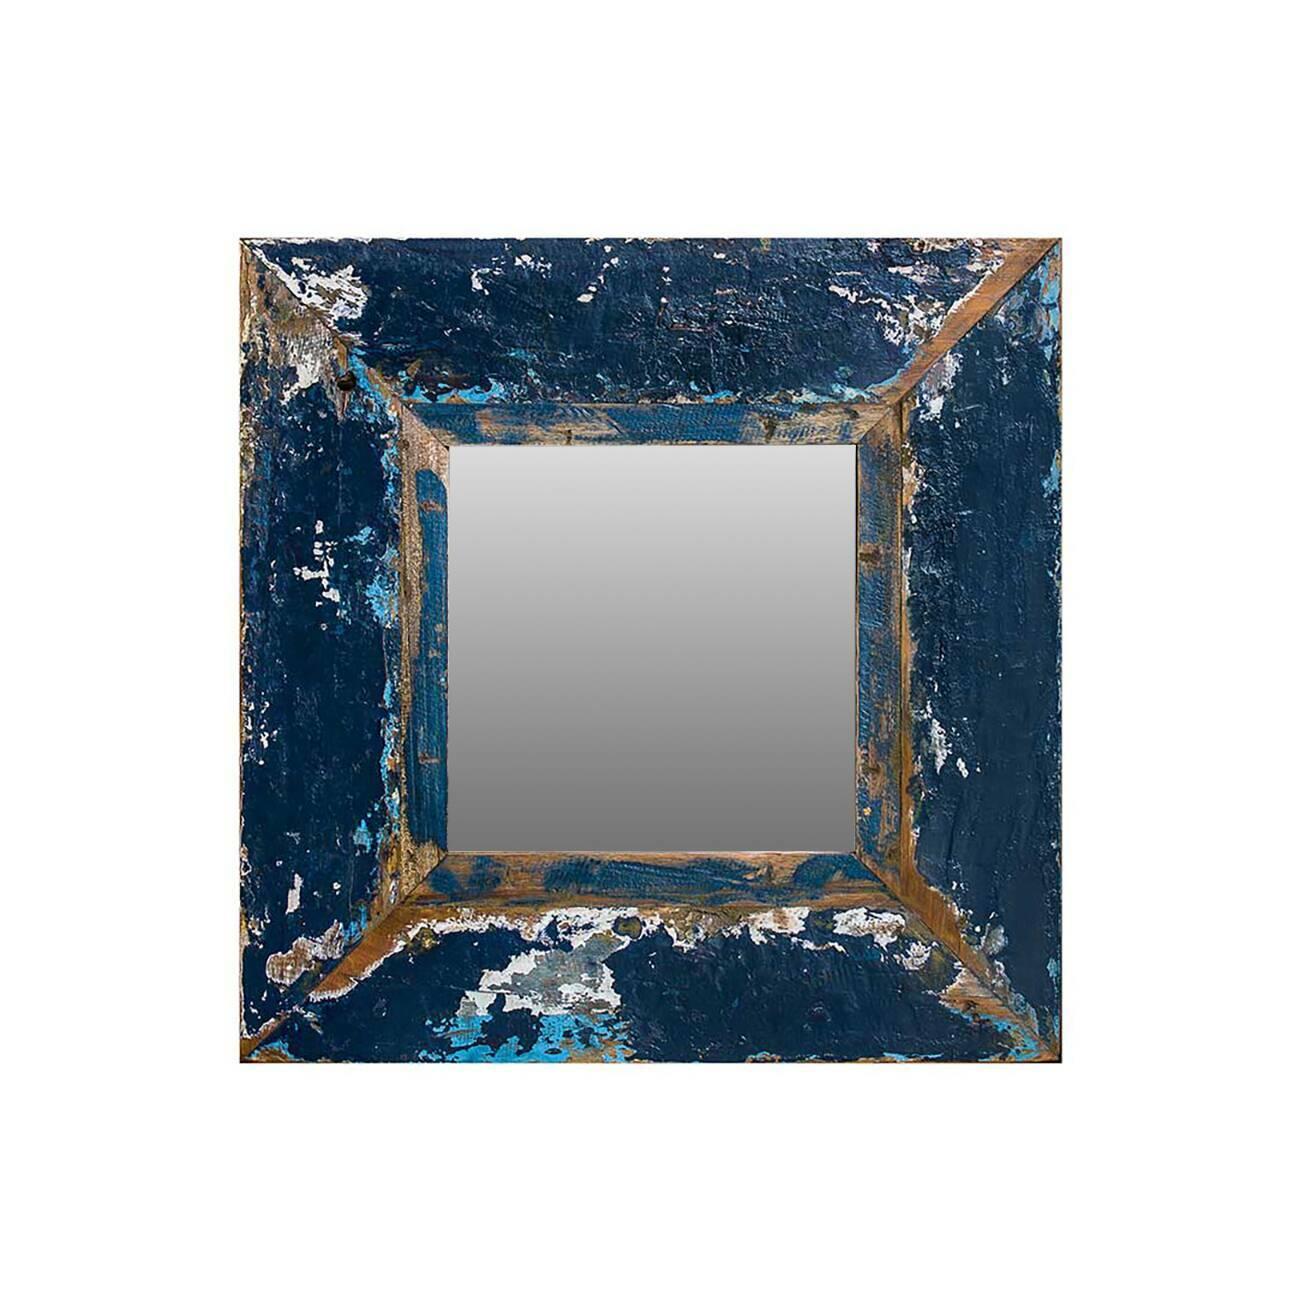 Зеркало Like Lodka 15576118 от Cosmorelax